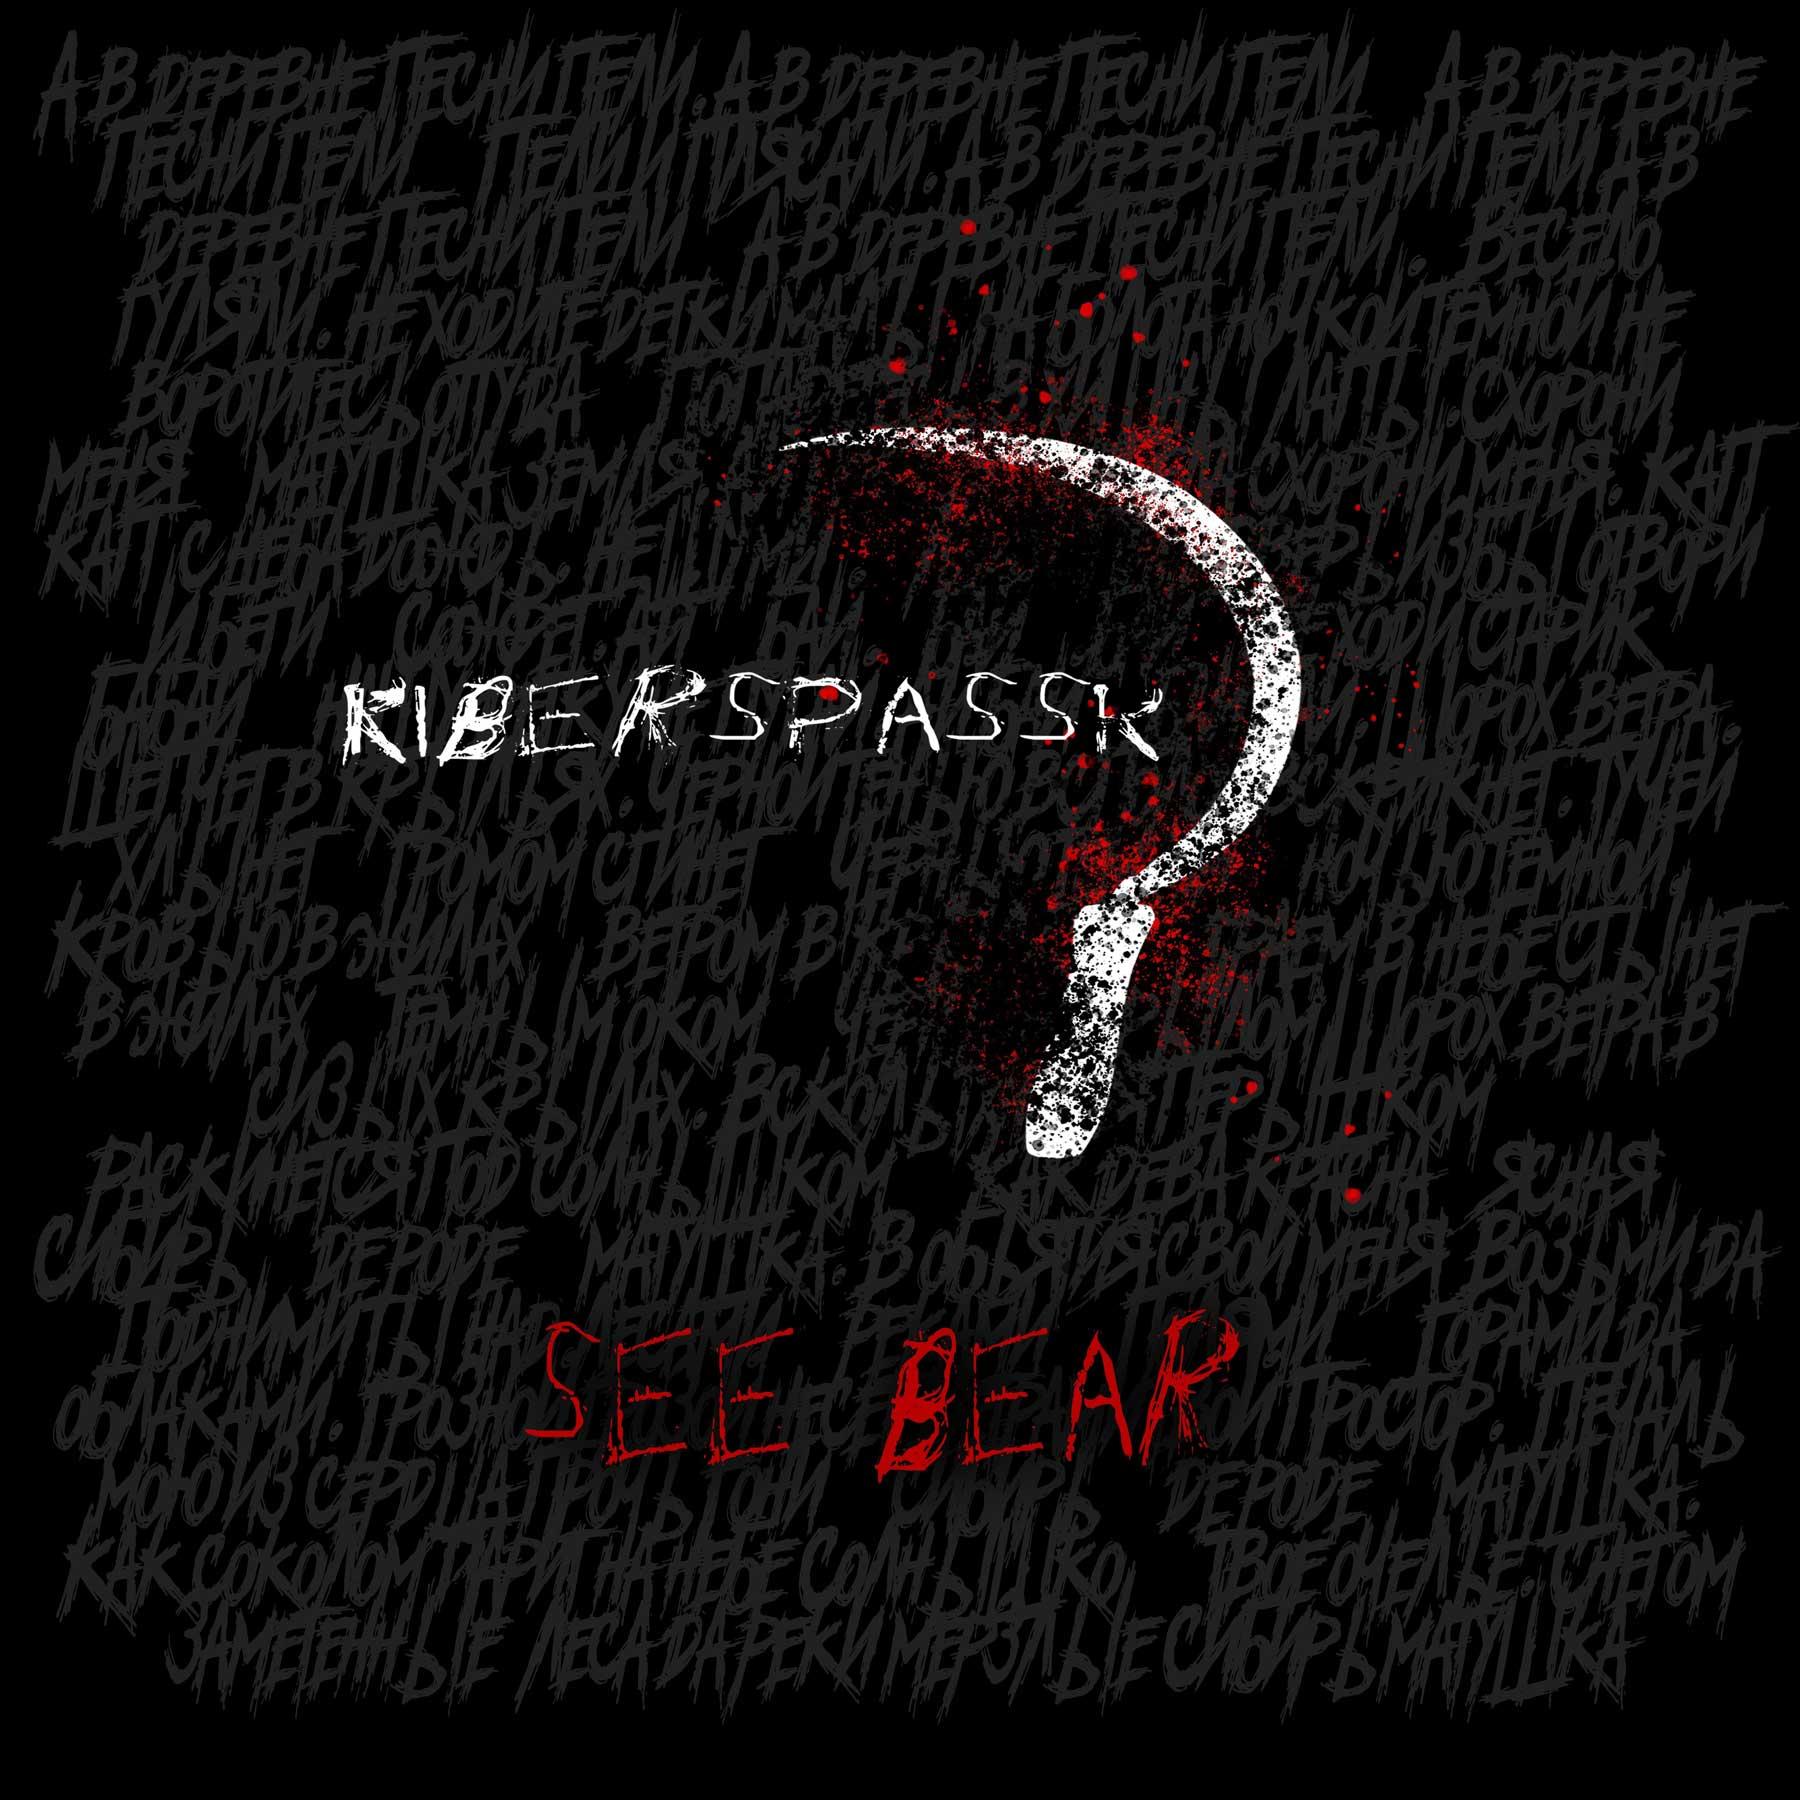 Kiberspassk - See Bear - Kiberspassk - See Bear